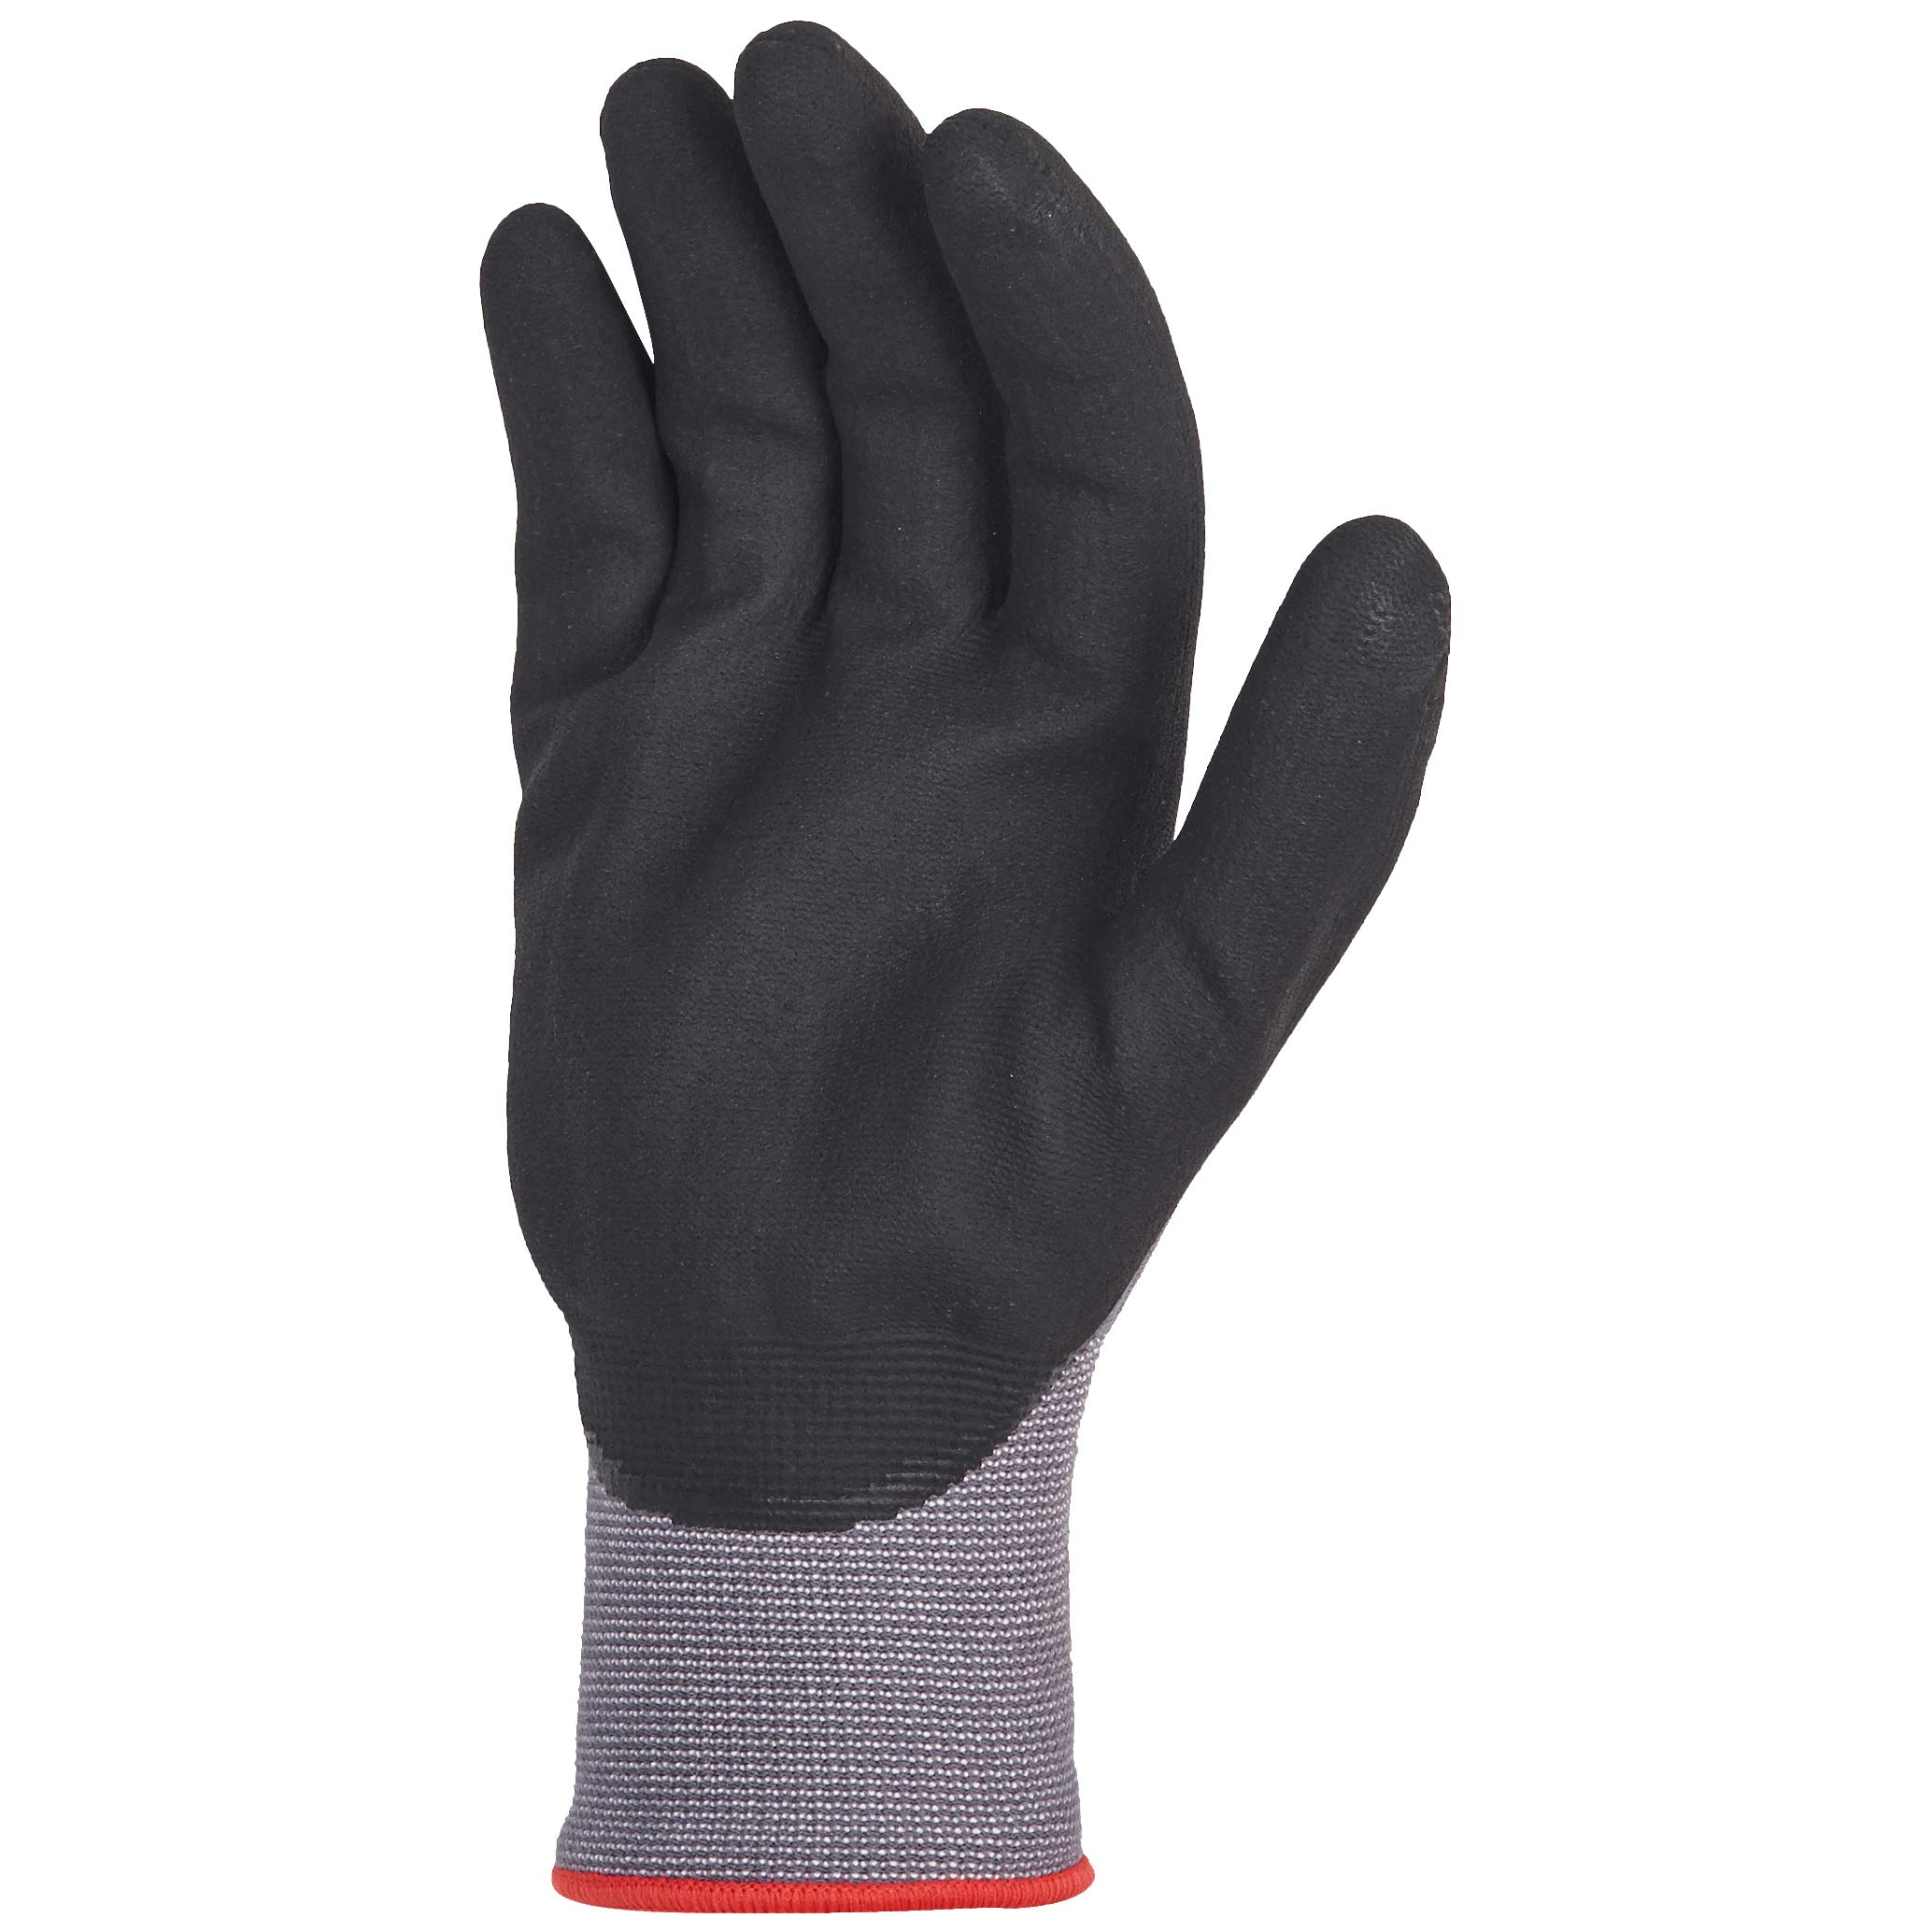 AmazonBasics Micro-Foam Nitrile Coated Work Gloves, Nylon Liner Fiber, Touch Screen, Grey, Size 9, L, 12-Pair by AmazonBasics (Image #5)